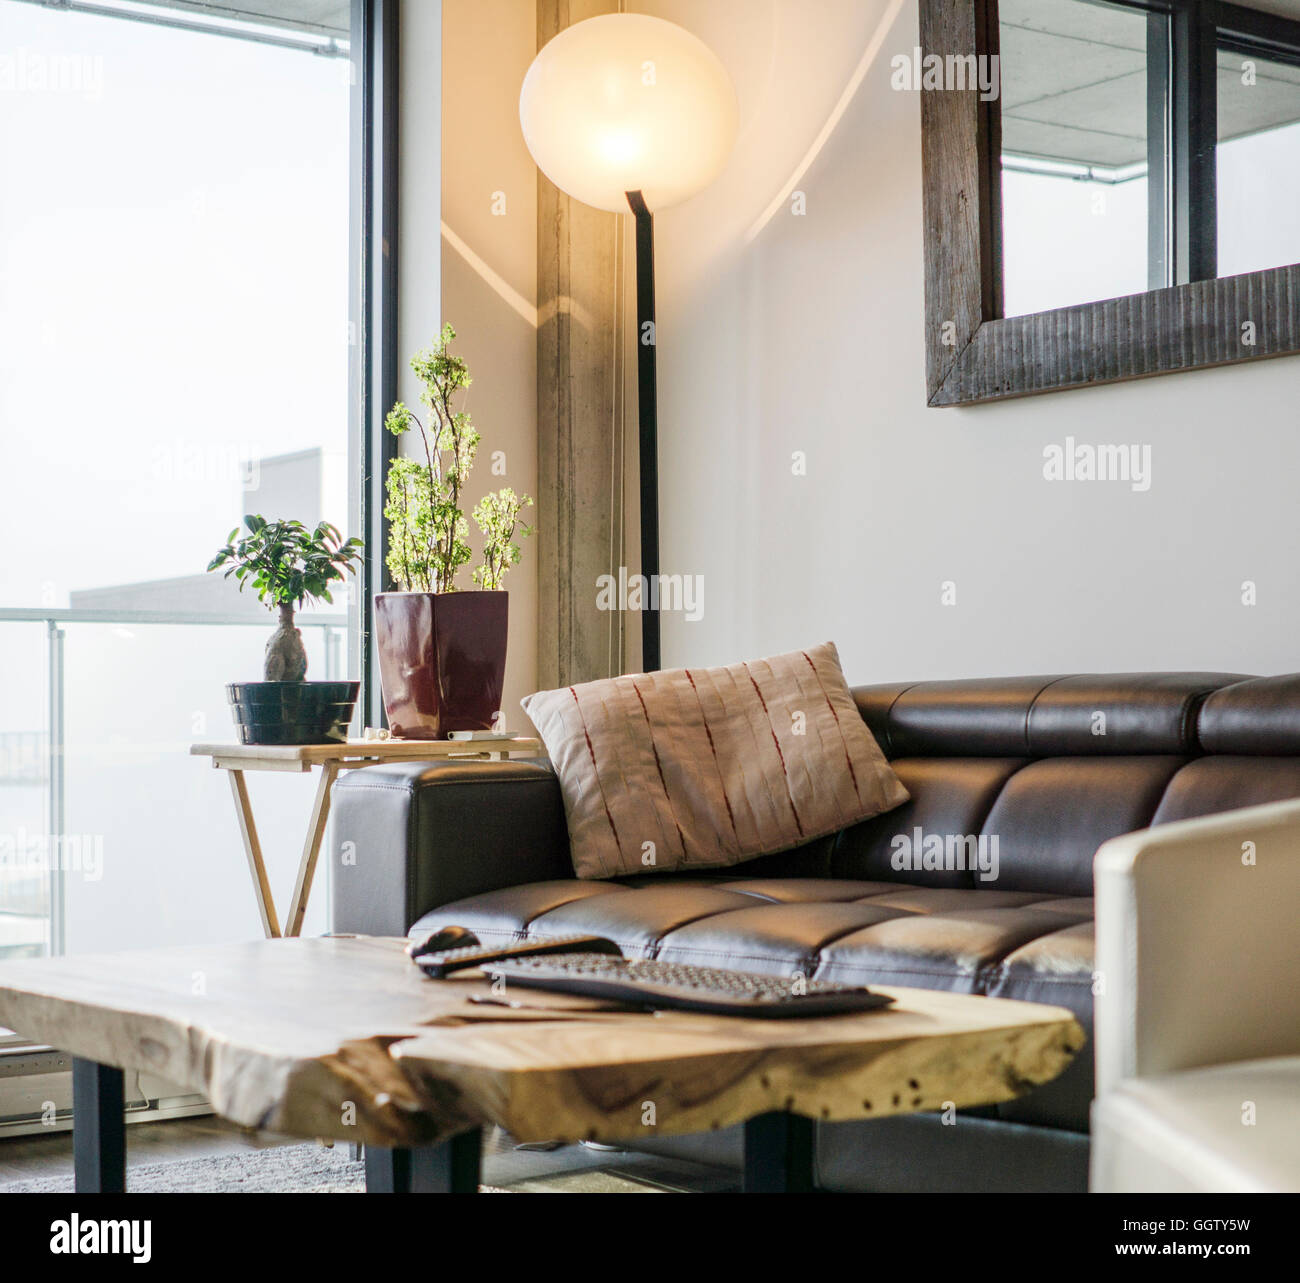 Sofa and armchair near livingroom window - Stock Image